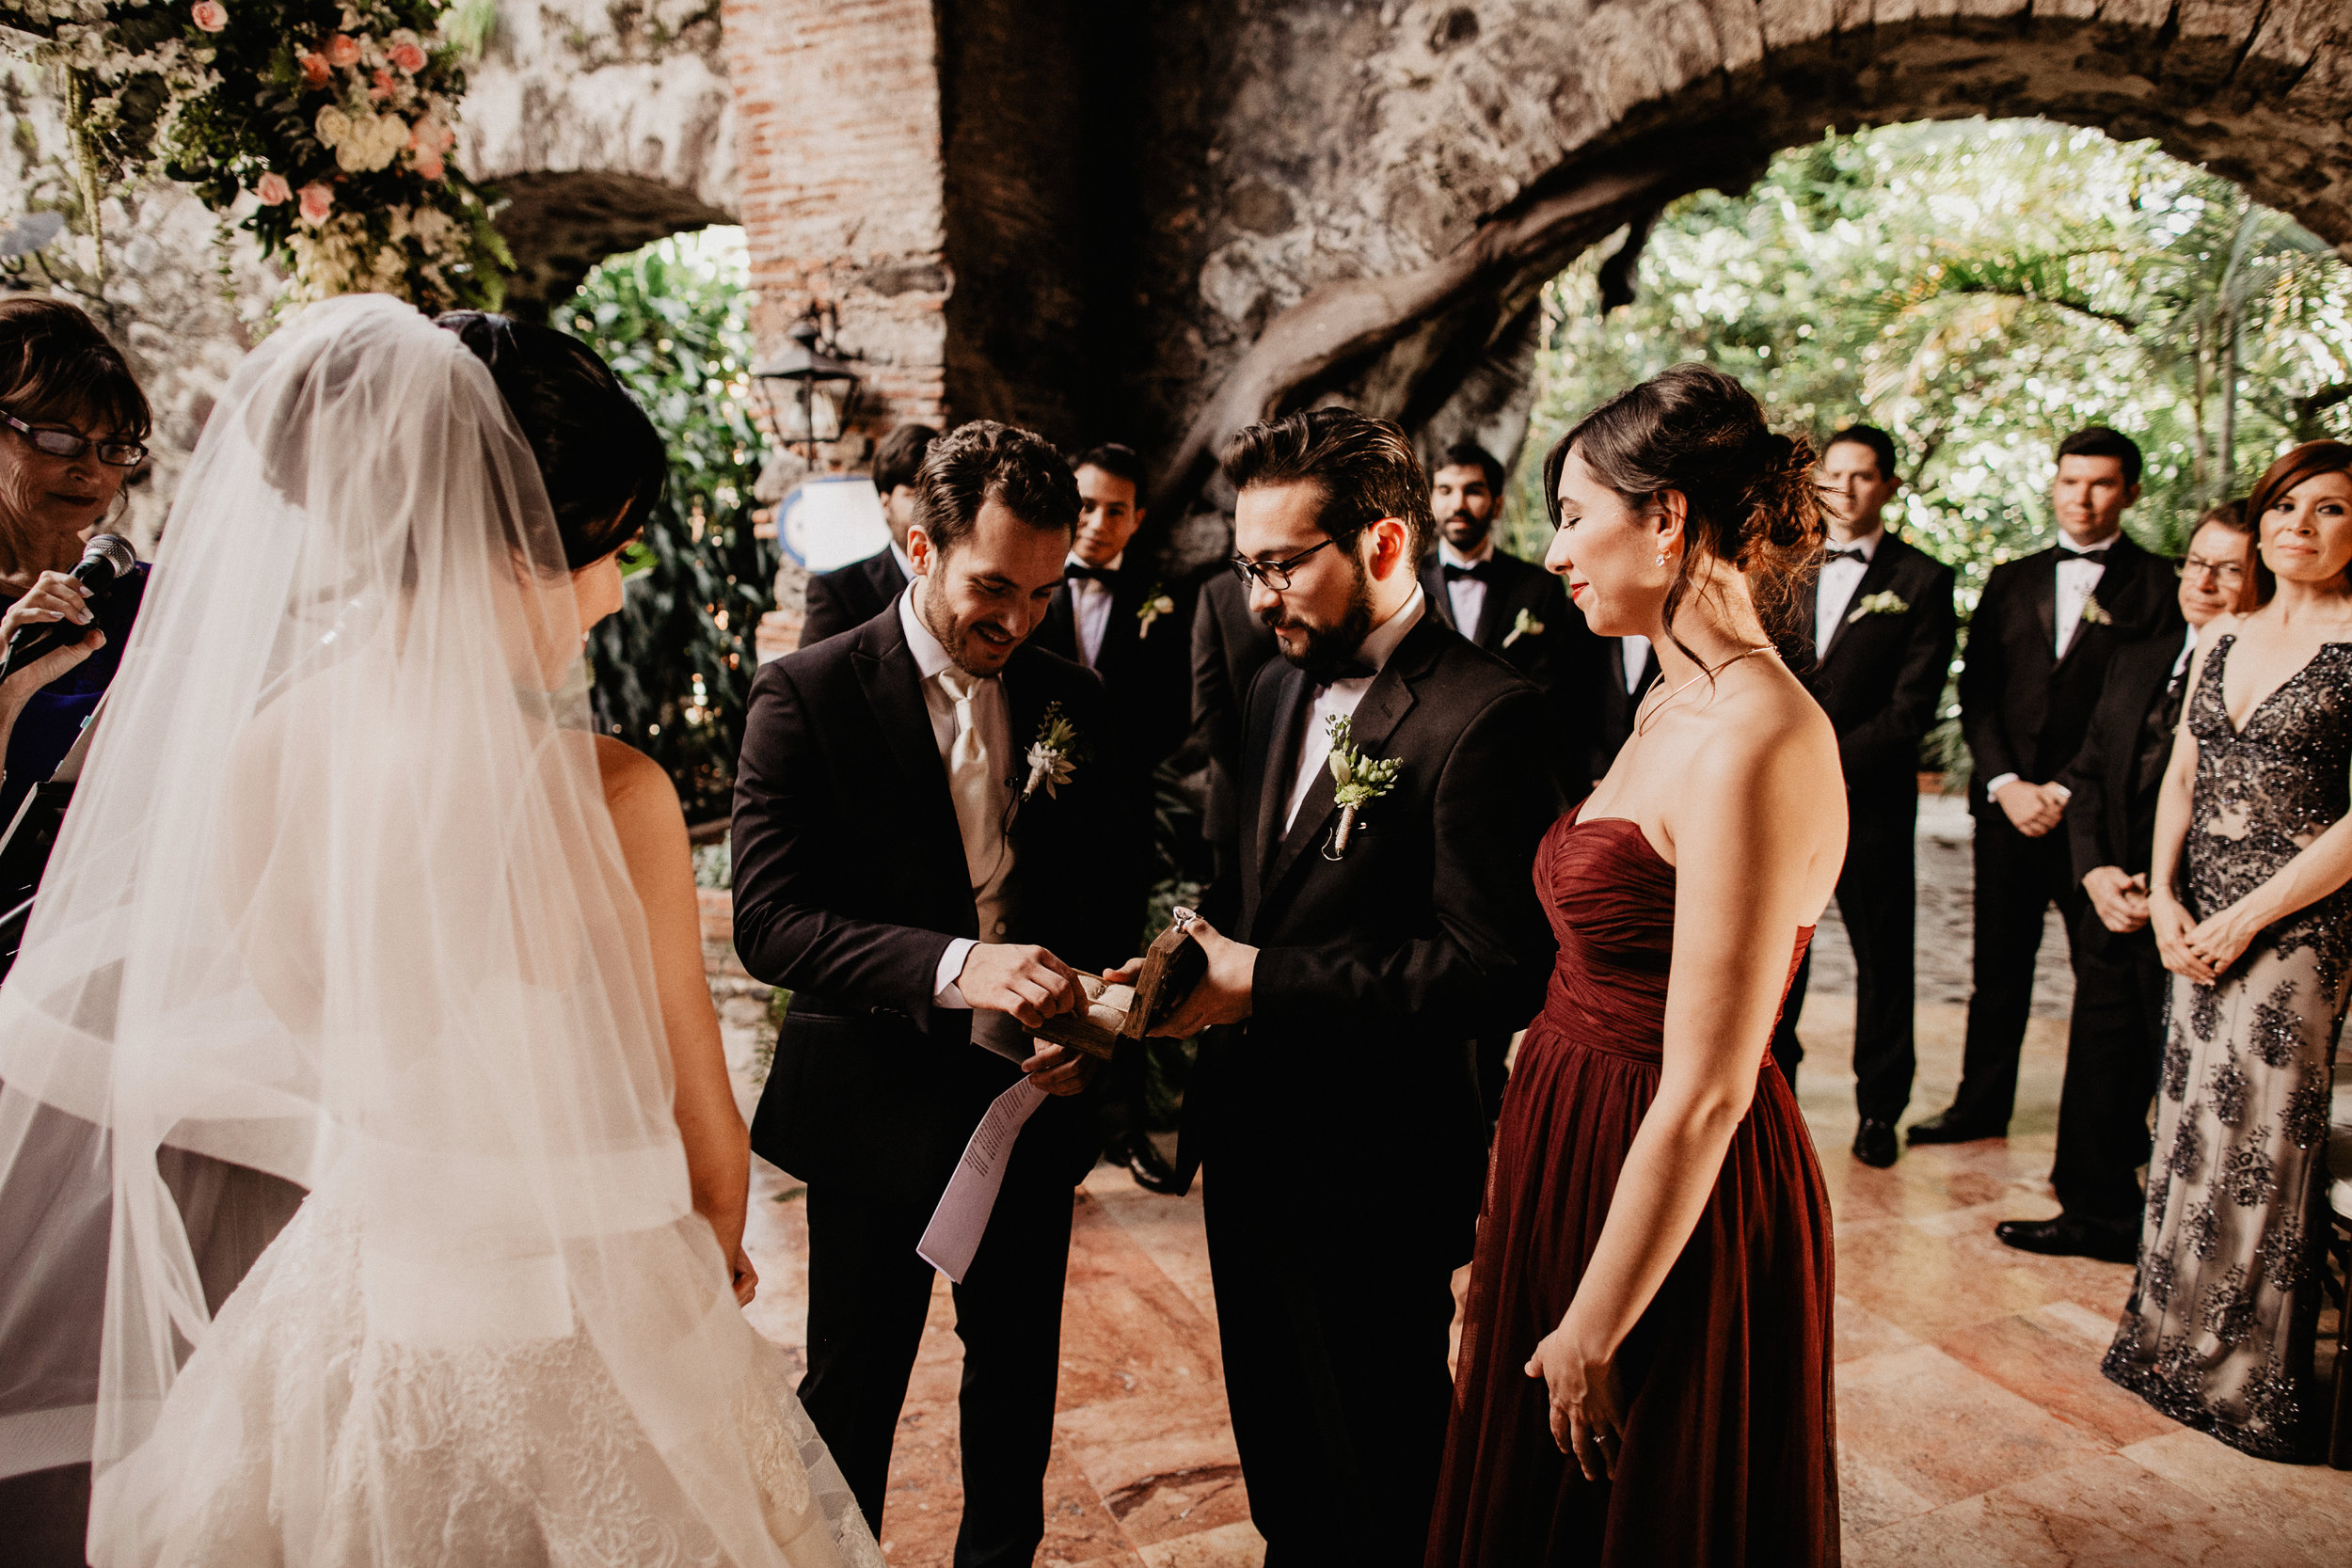 Alfonso_flores_destination_wedding_photography_vanesa_carlos-578.JPG